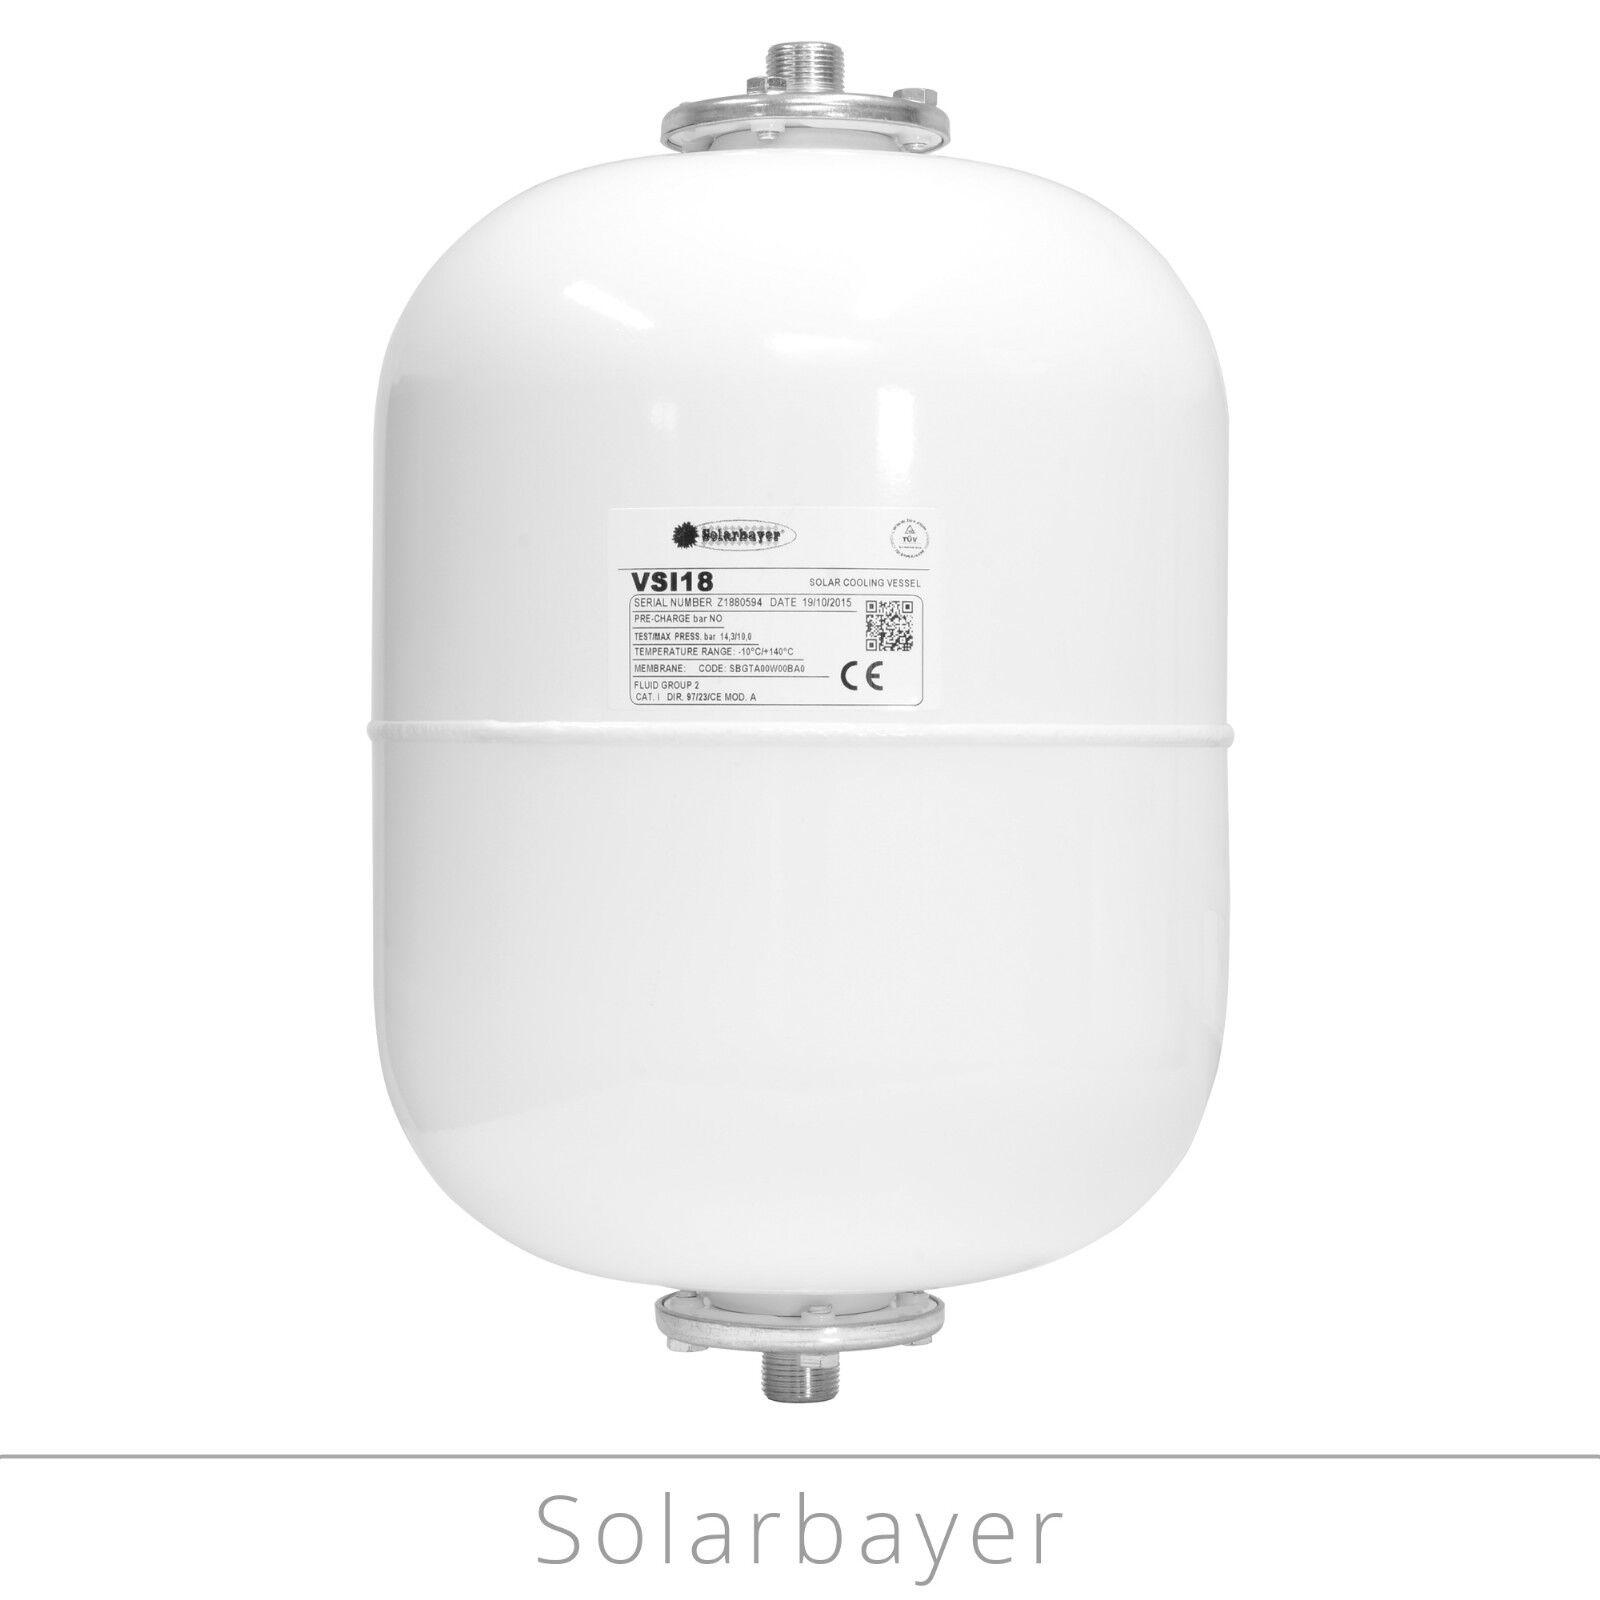 Solarbayer Solar Panel Modul System System System 14,14m² Warmwasser + Heizungsunterstützung 1ffb98